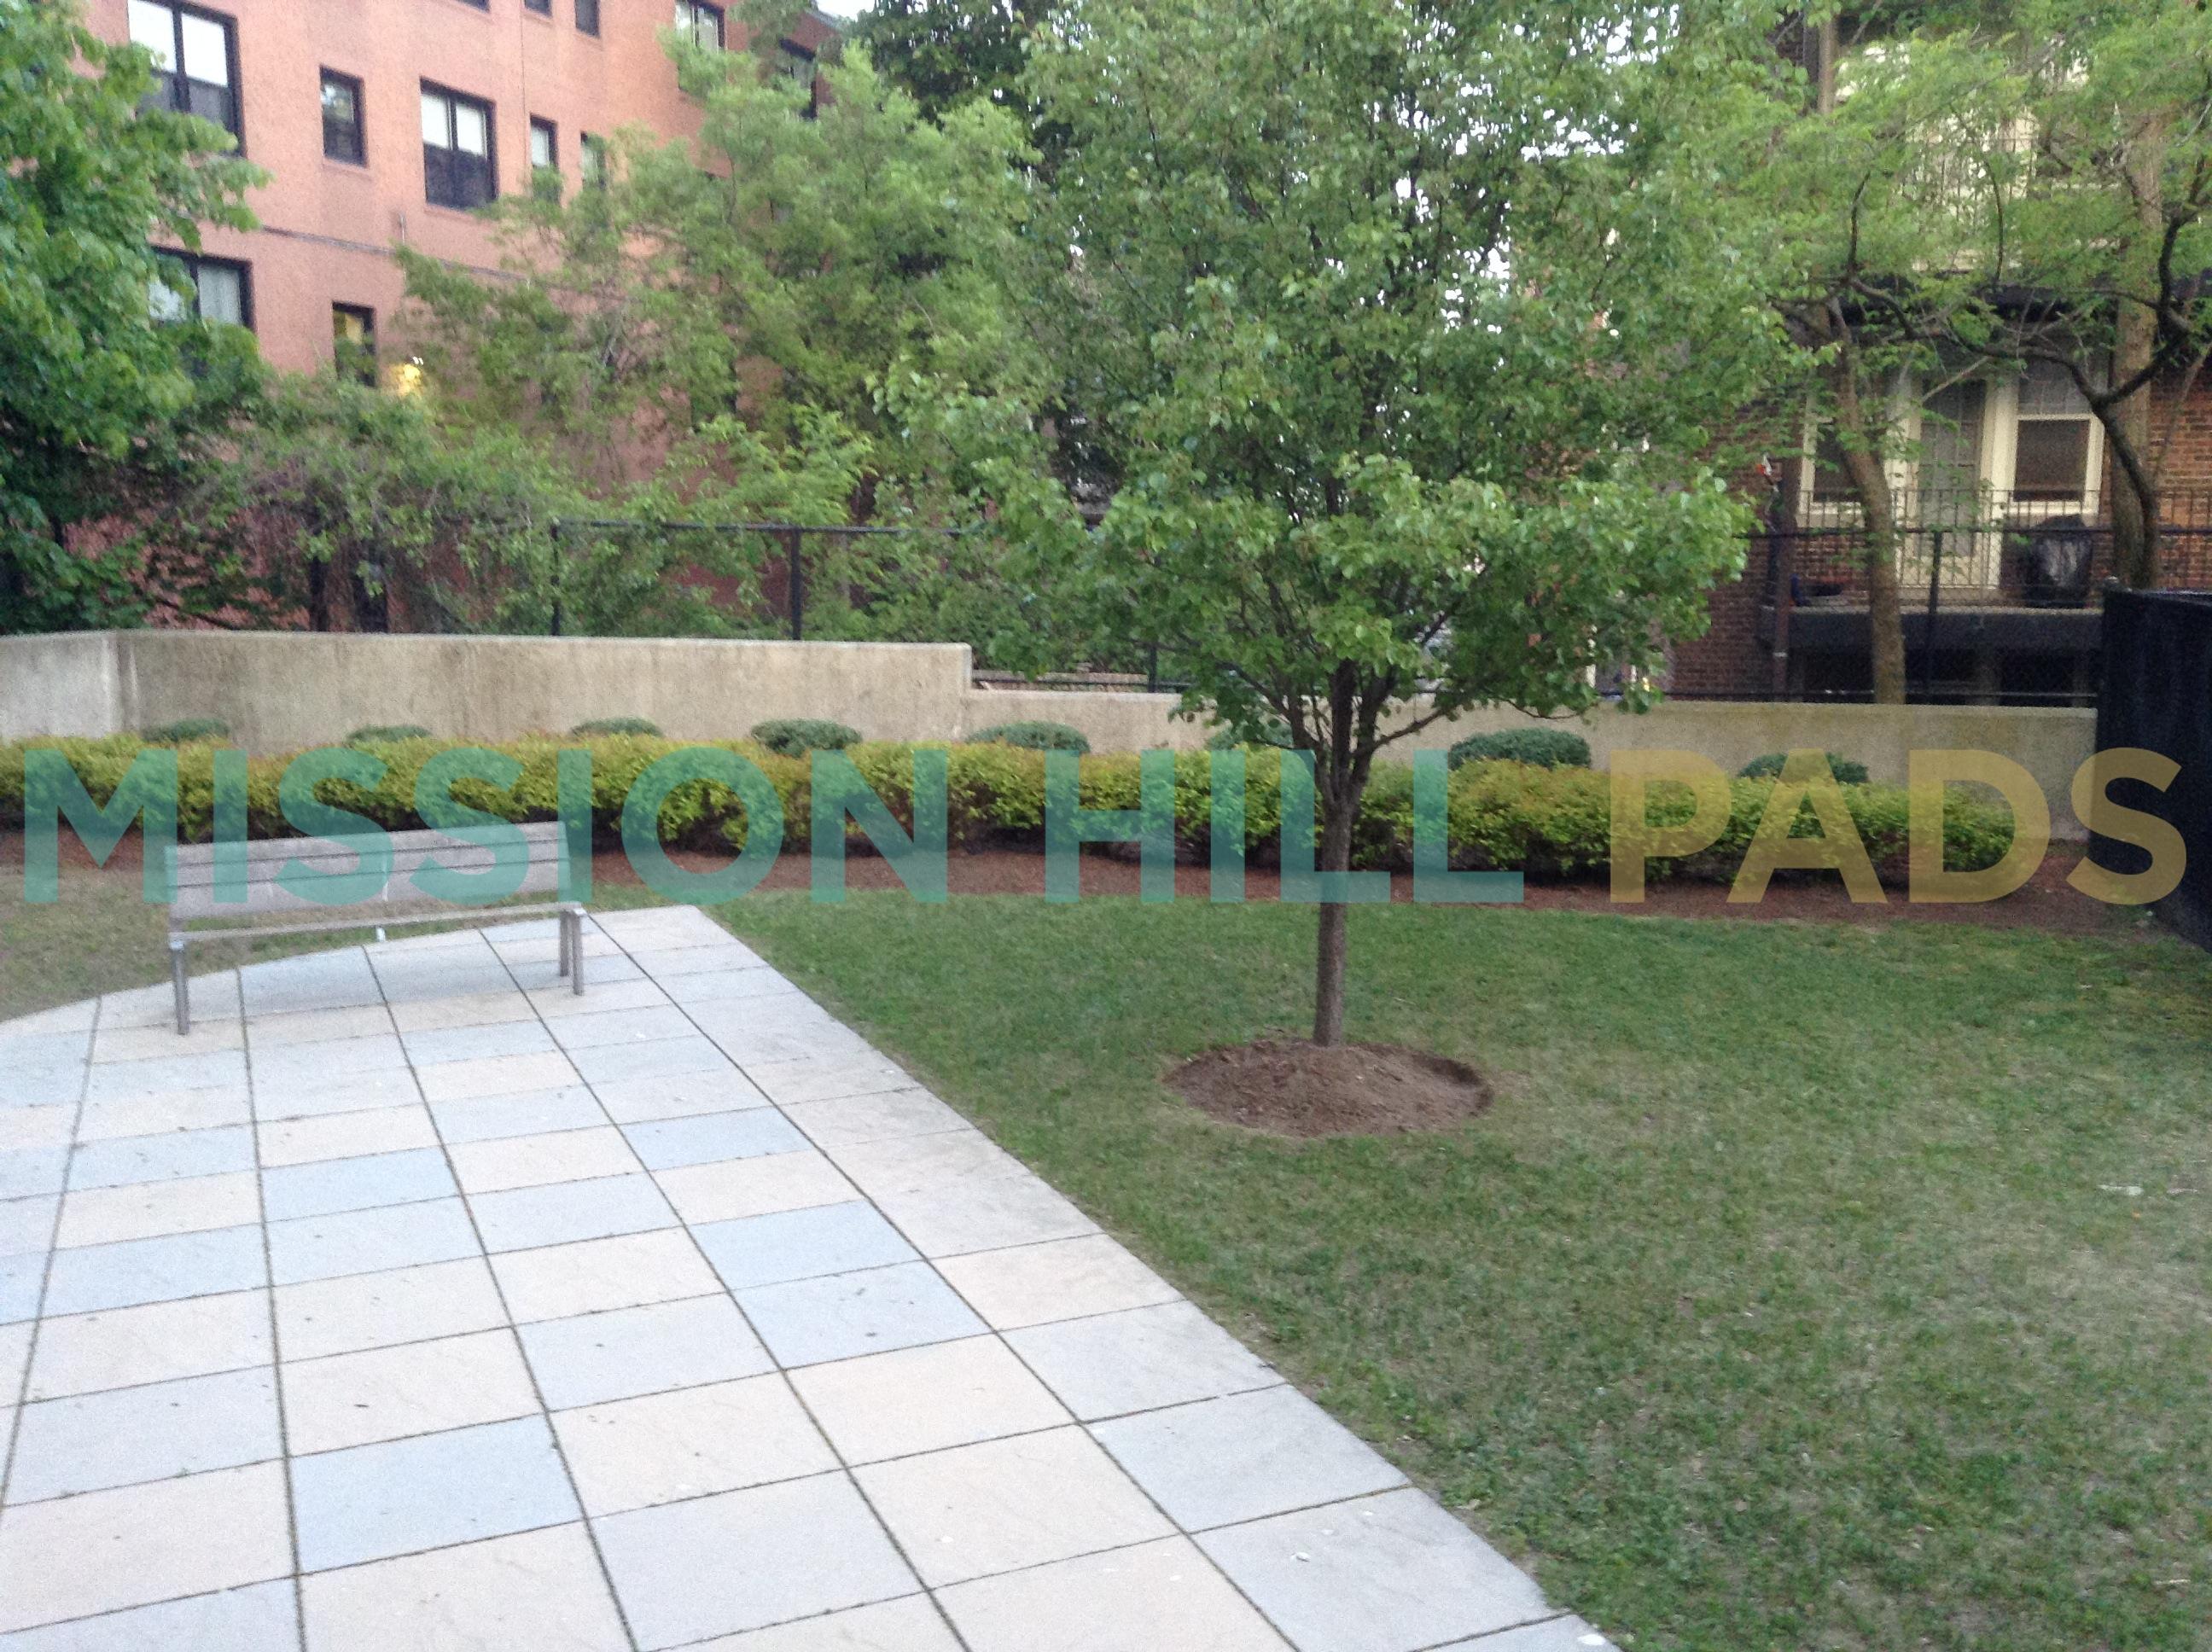 Madison Paradise Garden courtyard